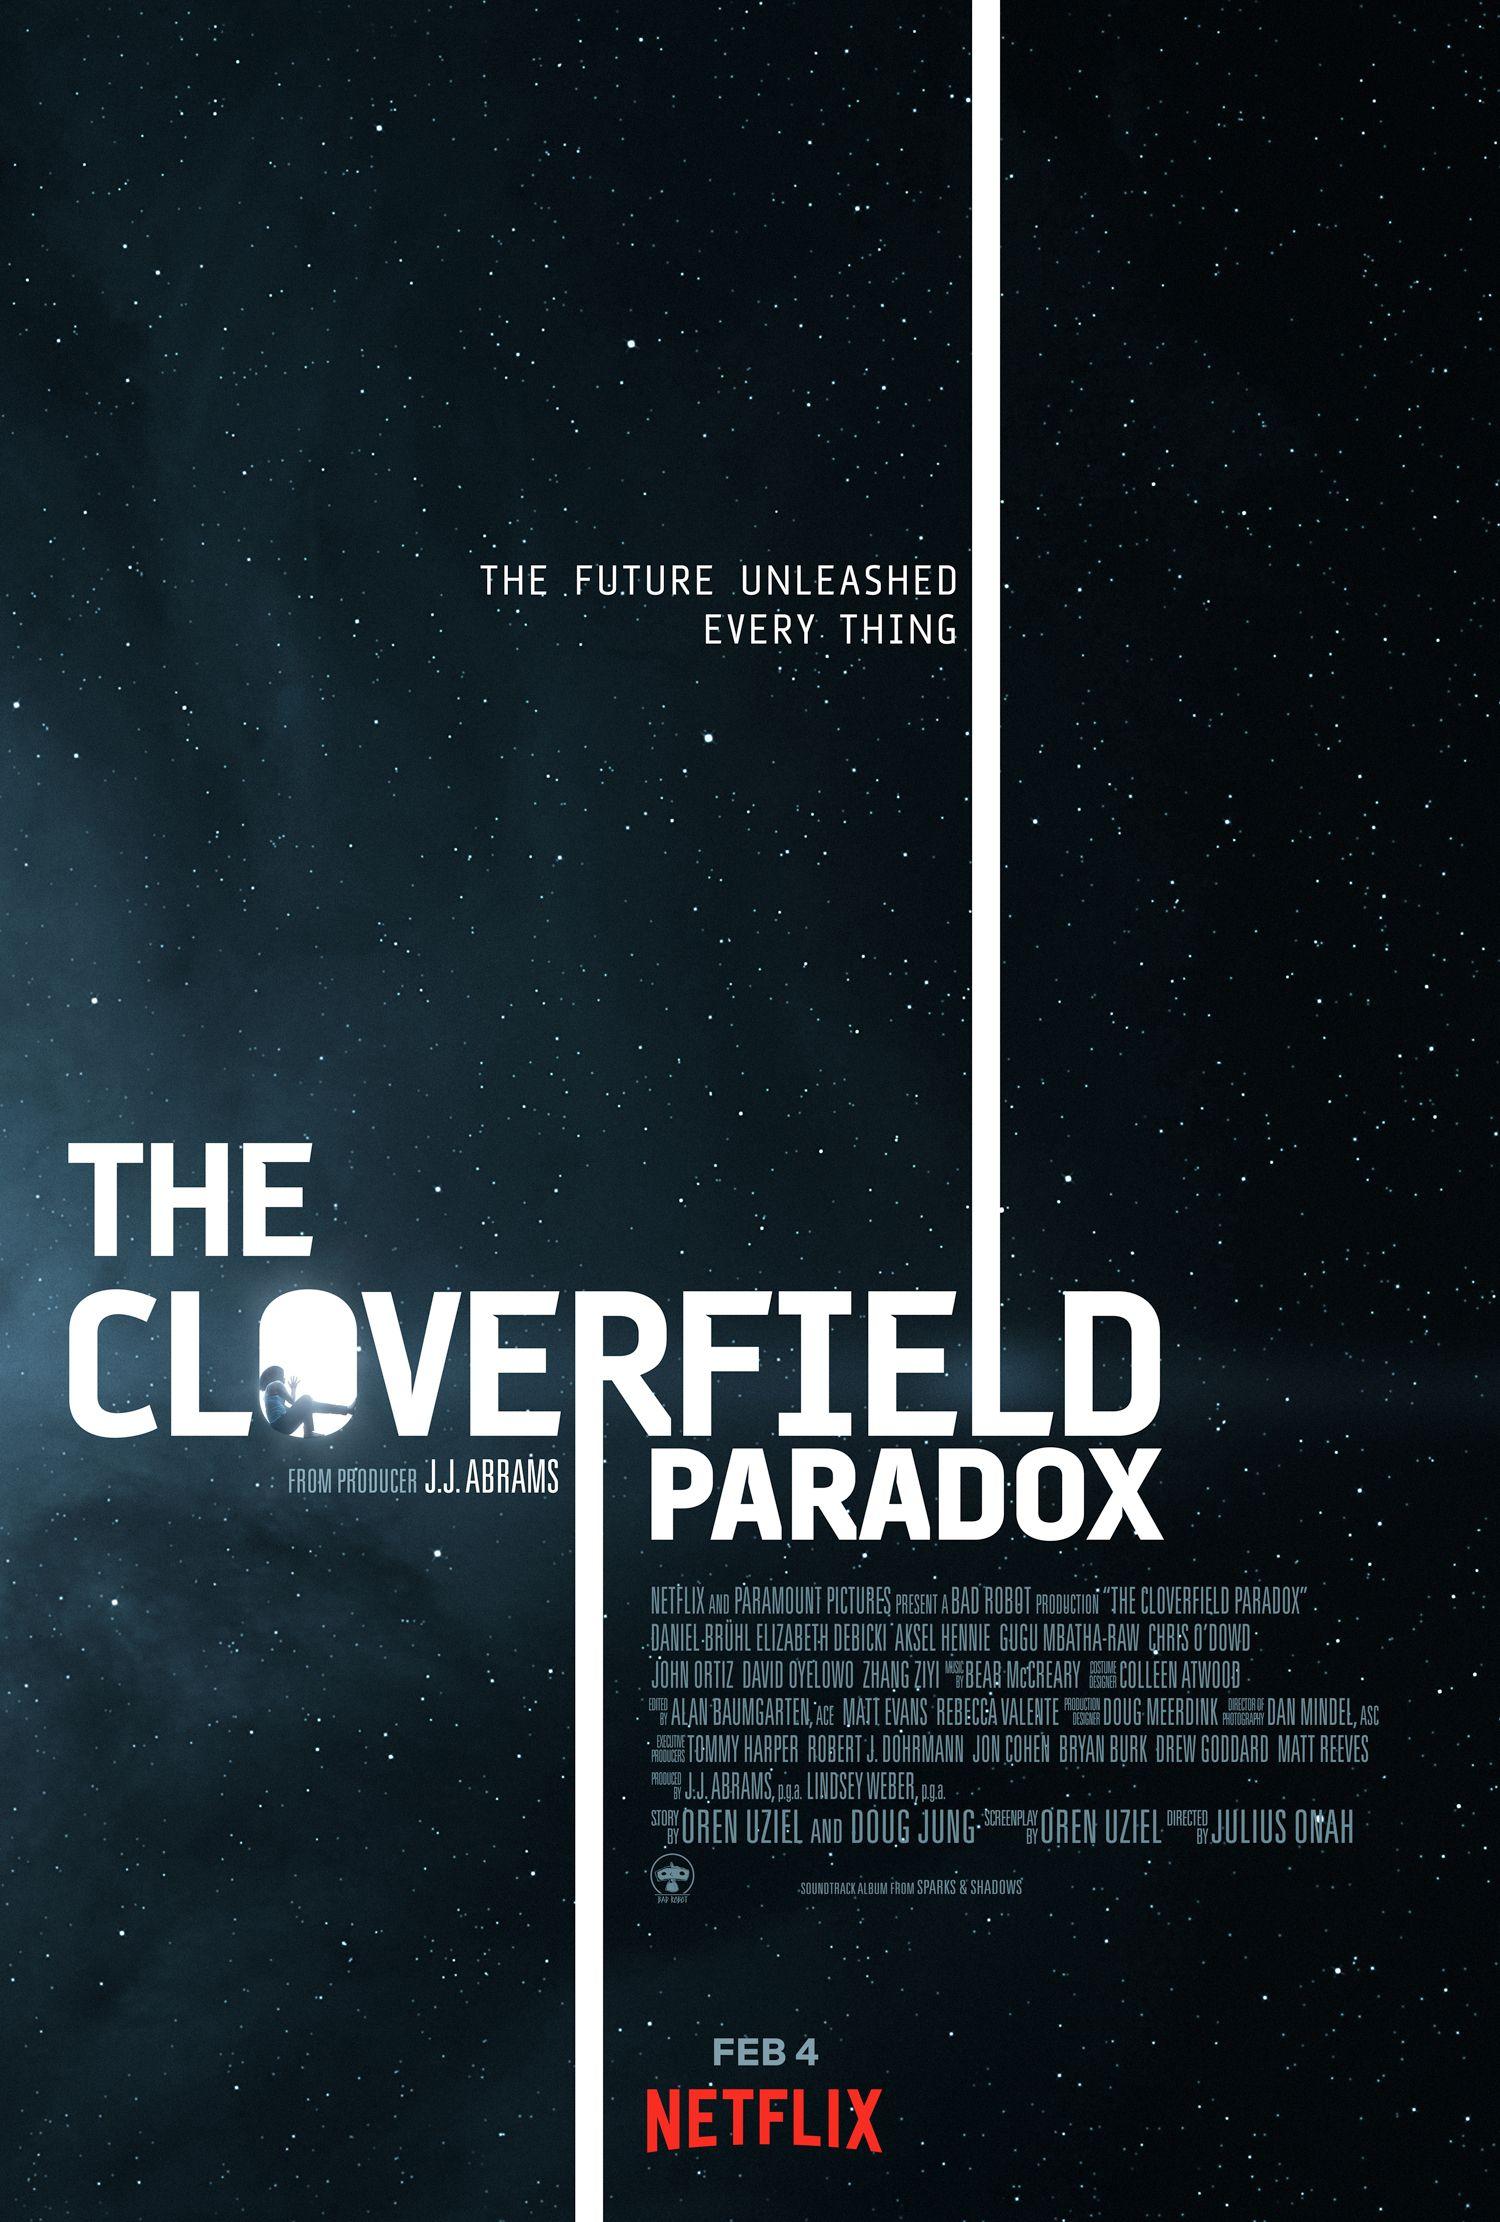 The Cloverfield Paradox Filmes Completos Online Gratis Filmes